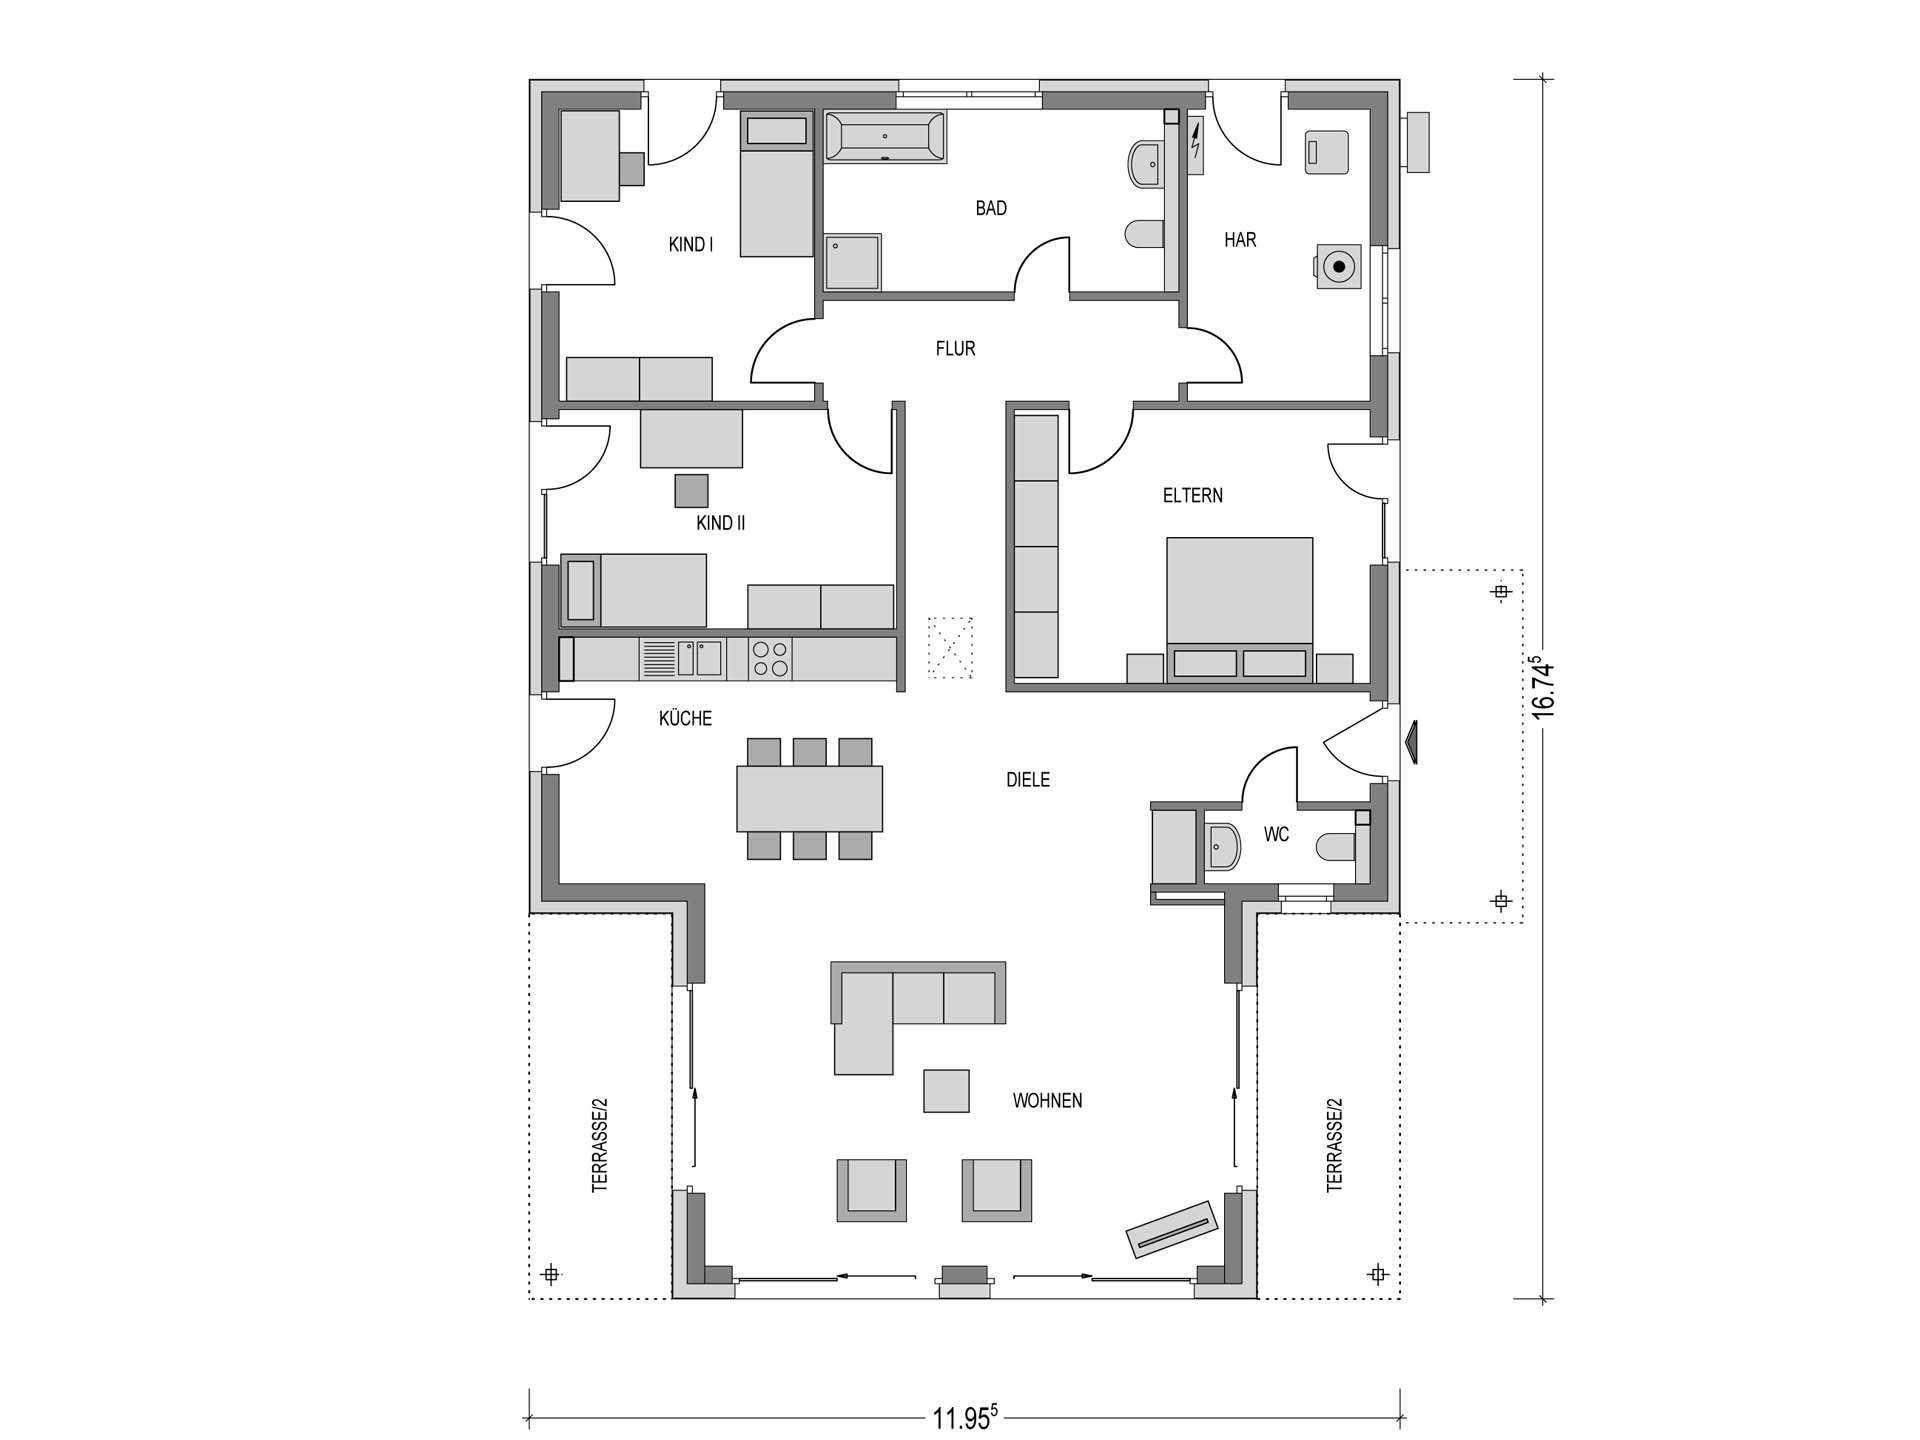 bungalow bauen anbieter preise grundrisse im berblick. Black Bedroom Furniture Sets. Home Design Ideas